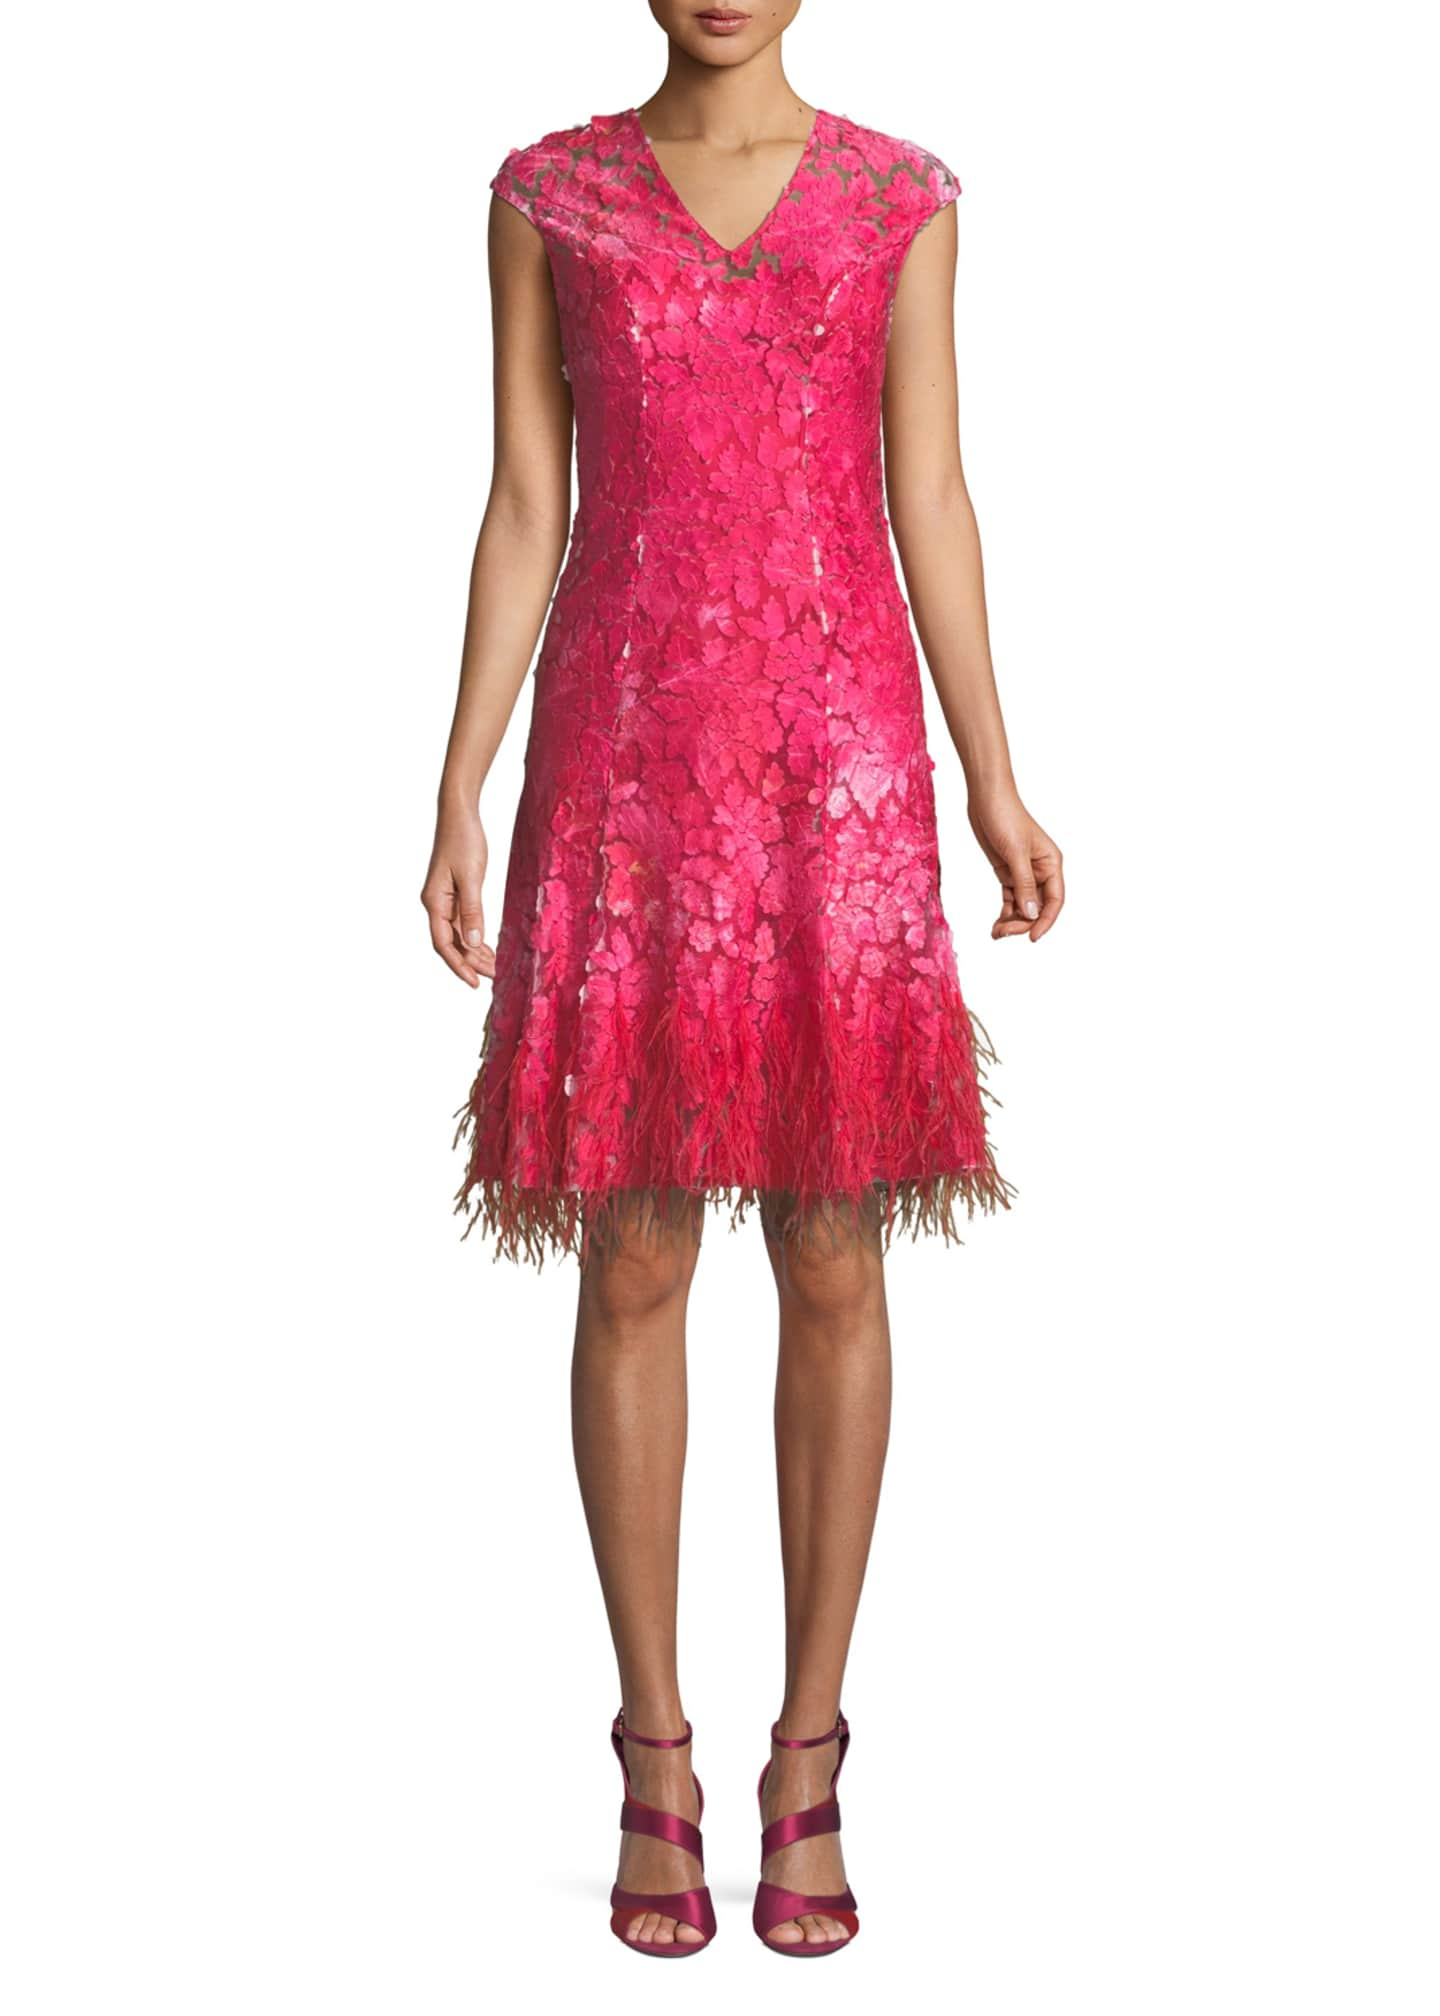 Elie Tahari Moriah Mesh Overlay Dress w/ Feather